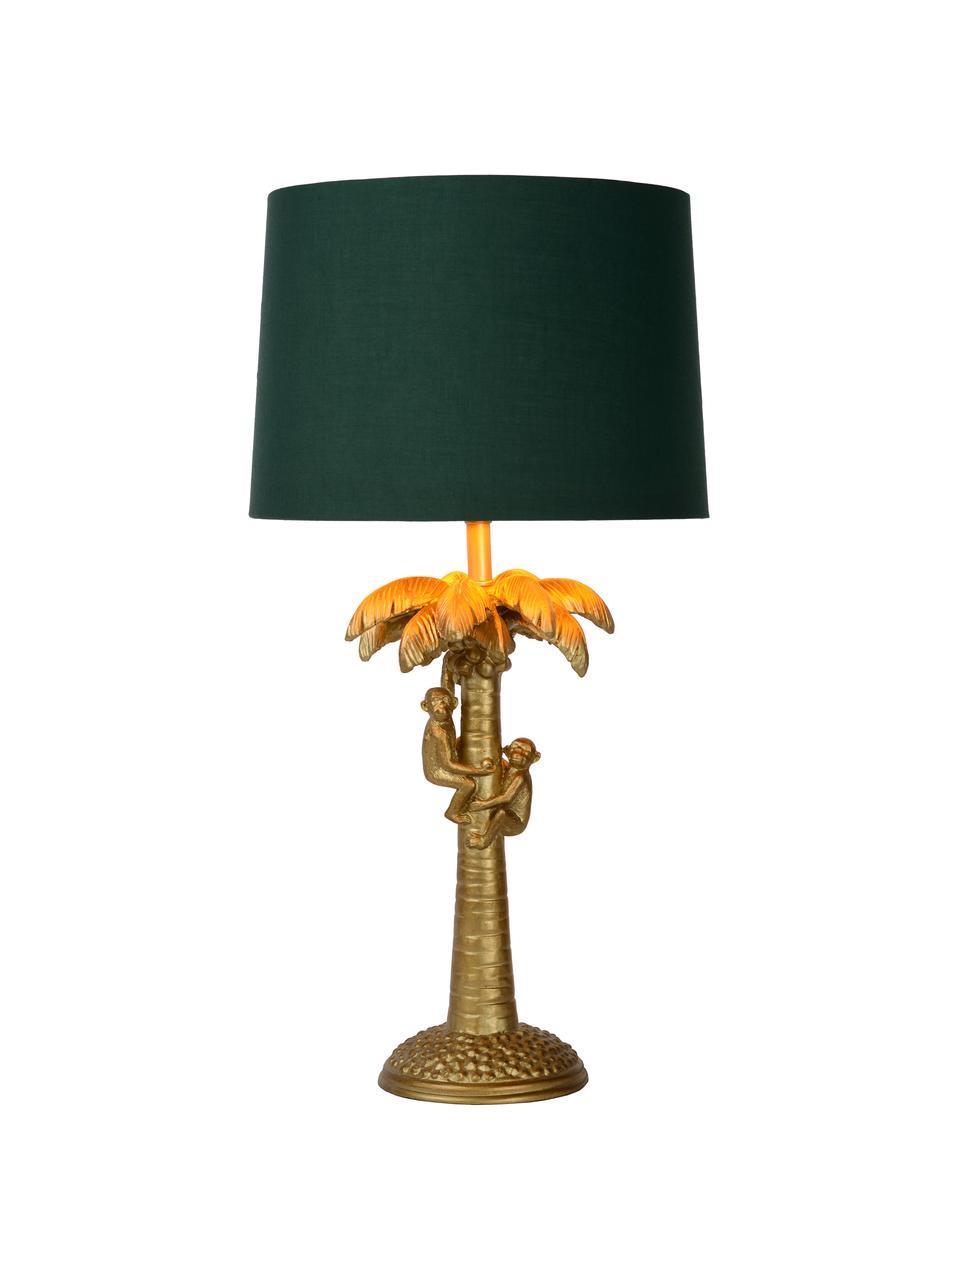 Große Boho-Tischlampe Coconut in Grün-Gold, Lampenschirm: Baumwolle, Lampenfuß: Kunststoff, Messingfarben, Grün, Ø 31 x H 58 cm